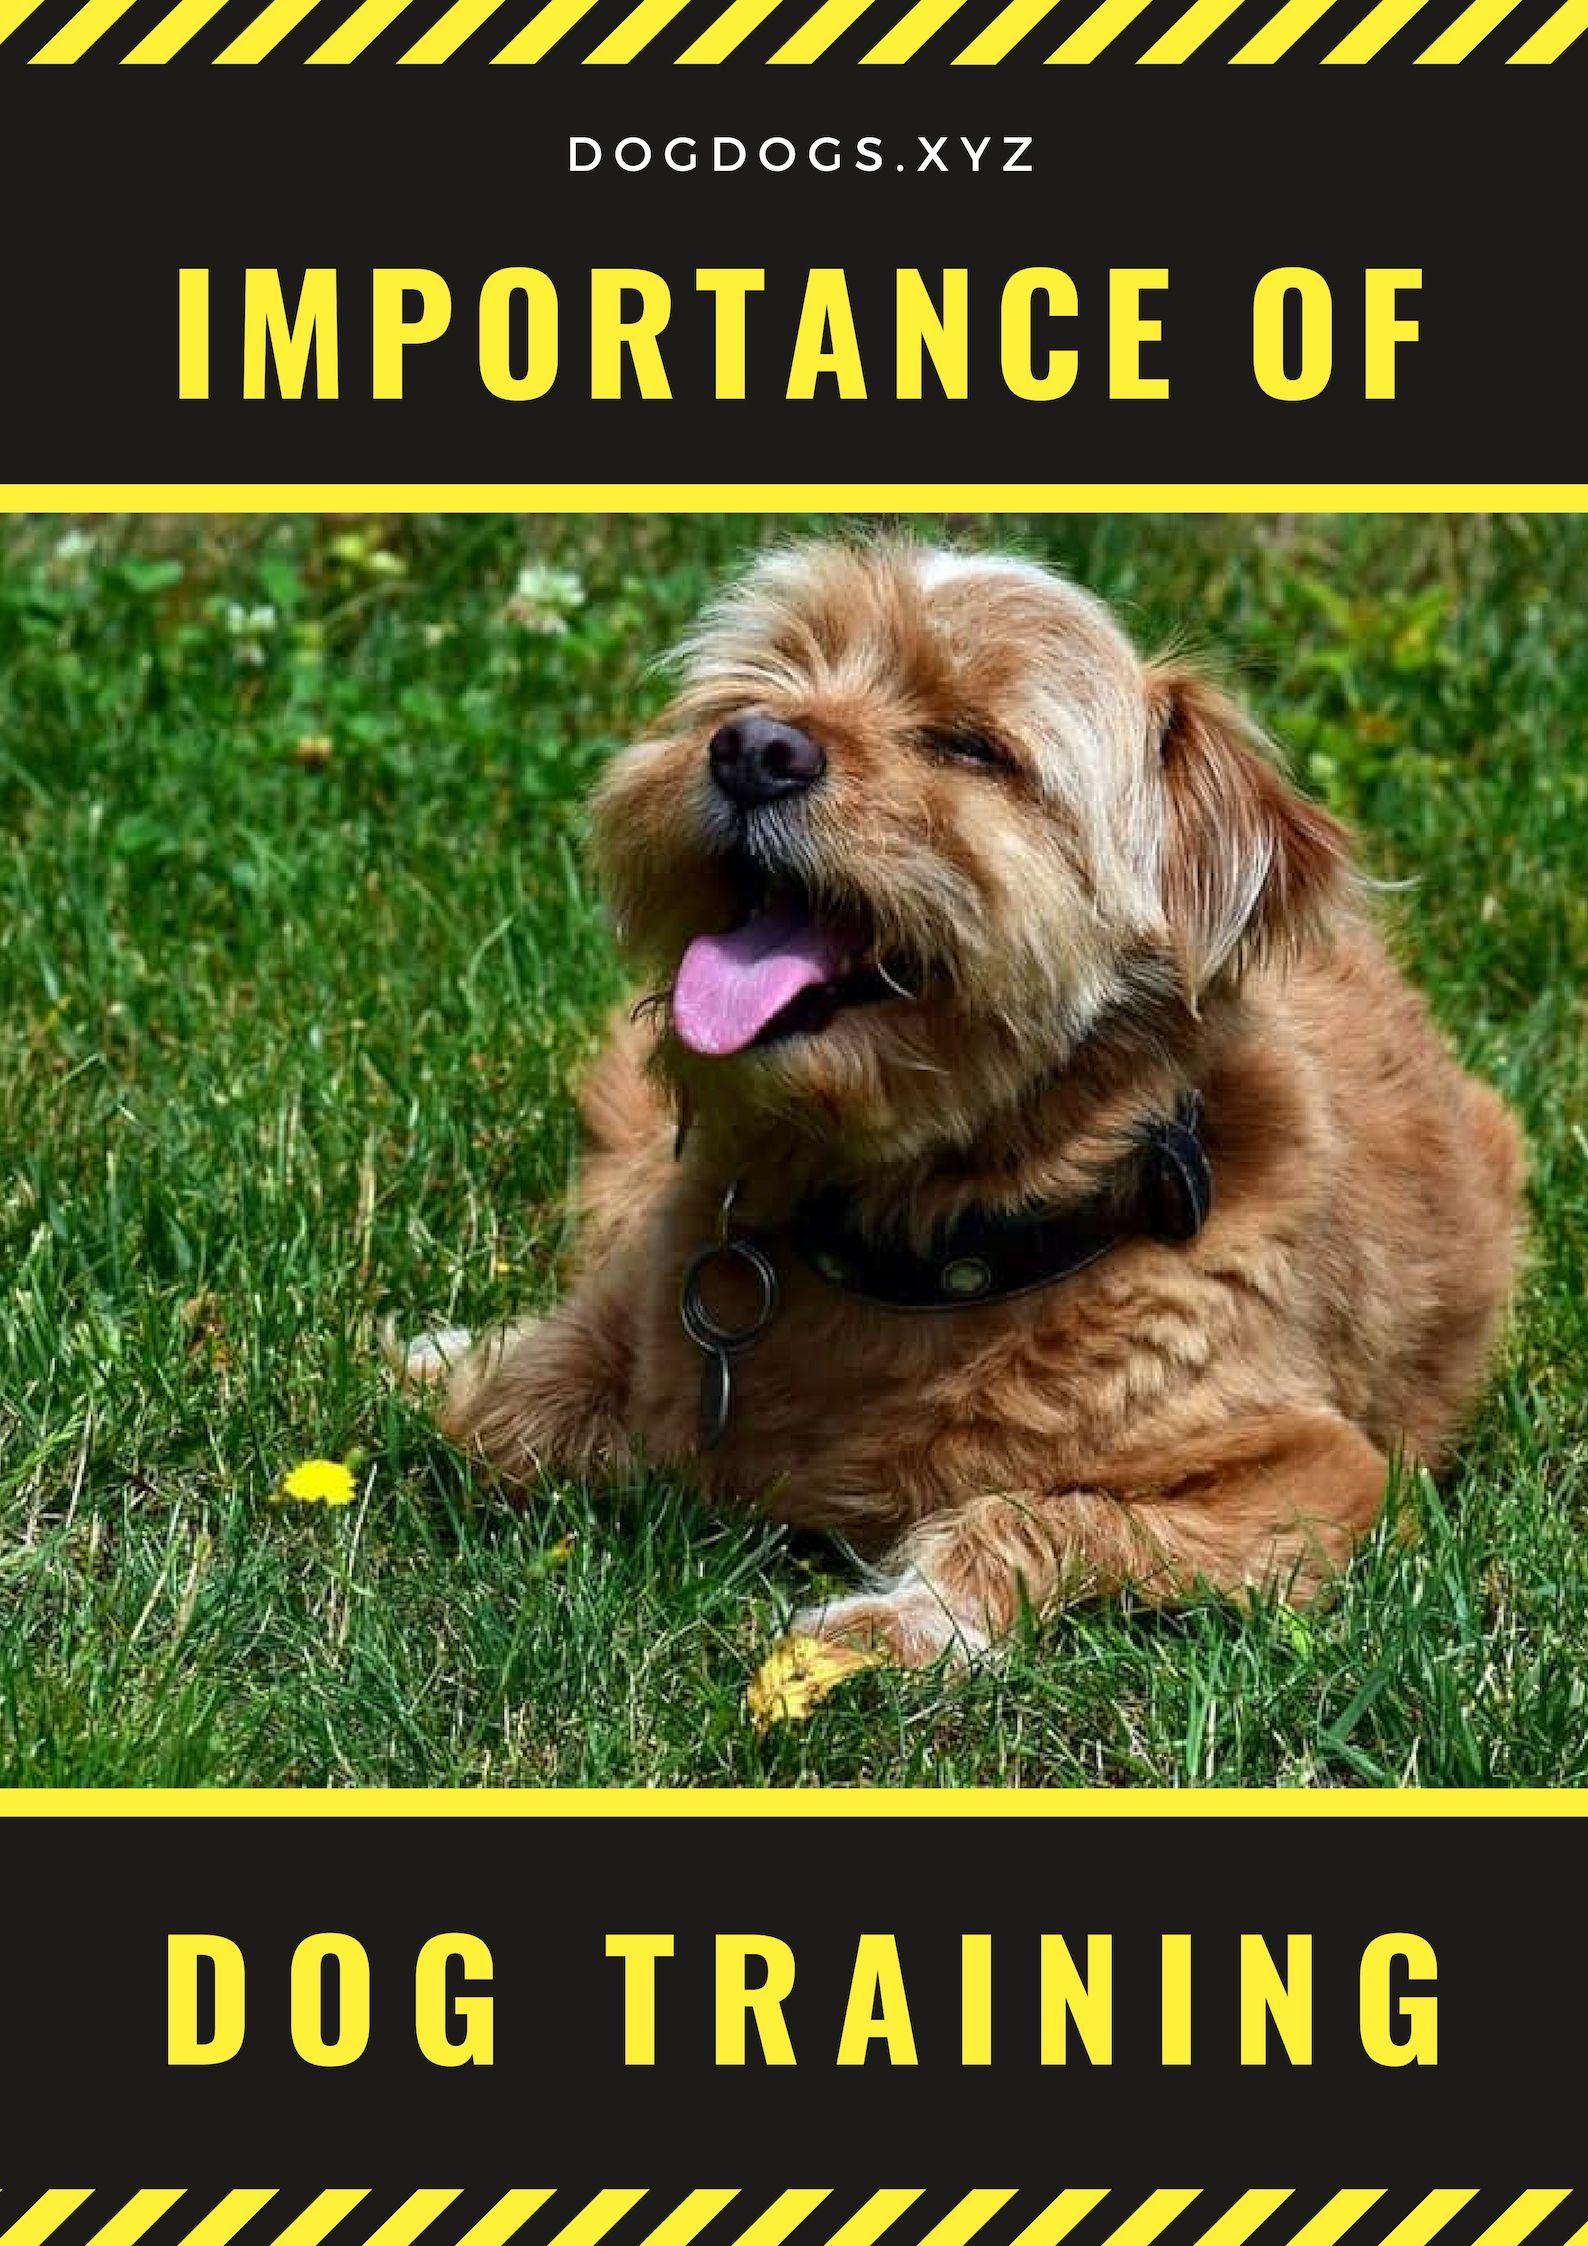 Fearful Small Dog Collar Dogfoodie Militarydogtraining Dog